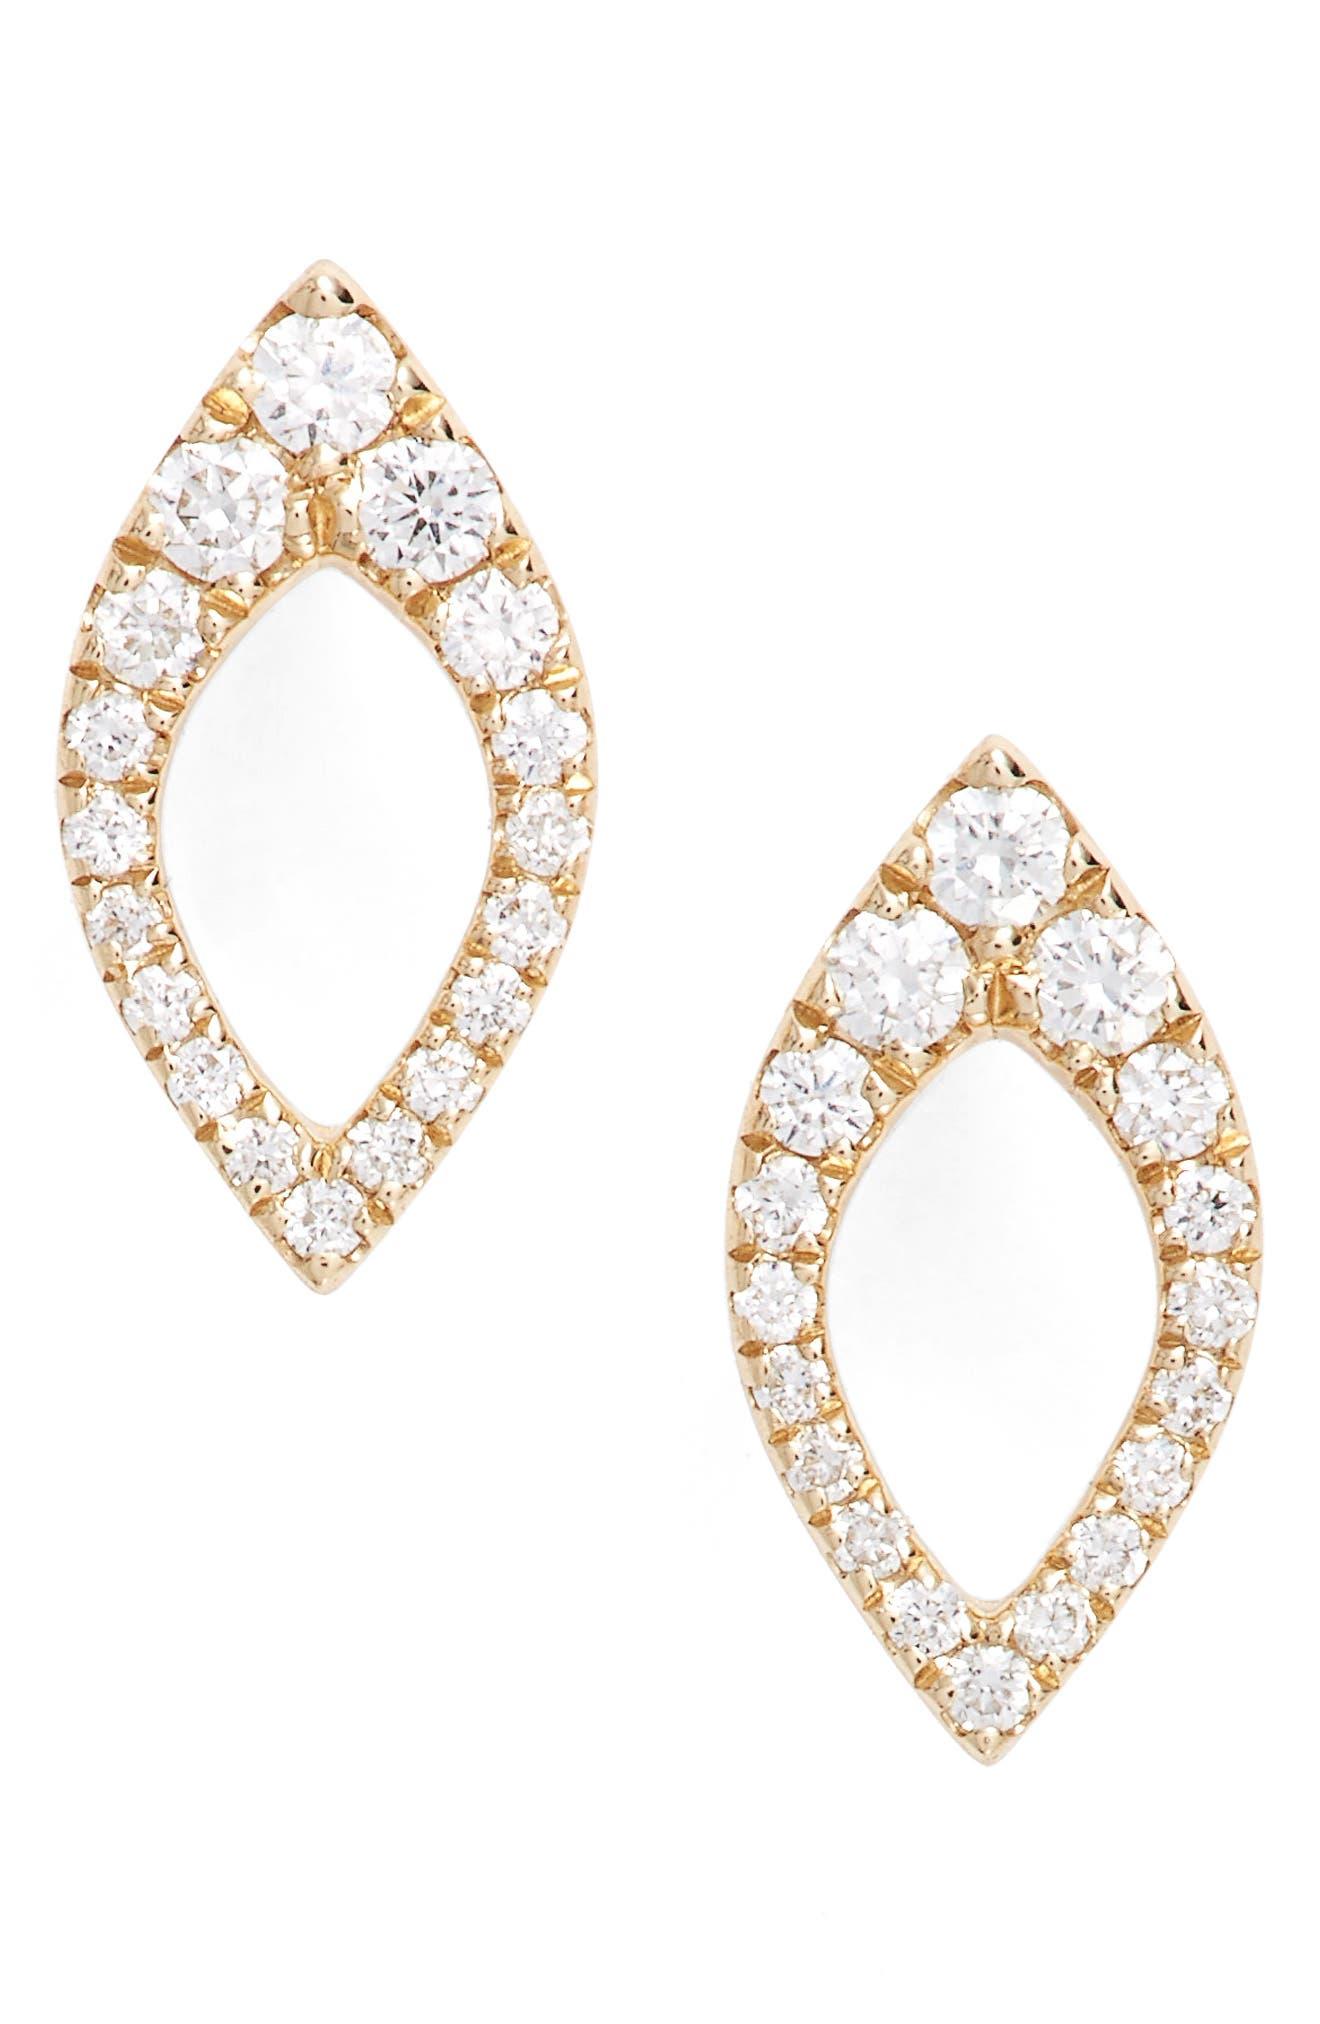 Main Image - Dana Rebecca Designs Marquise Diamond Studs